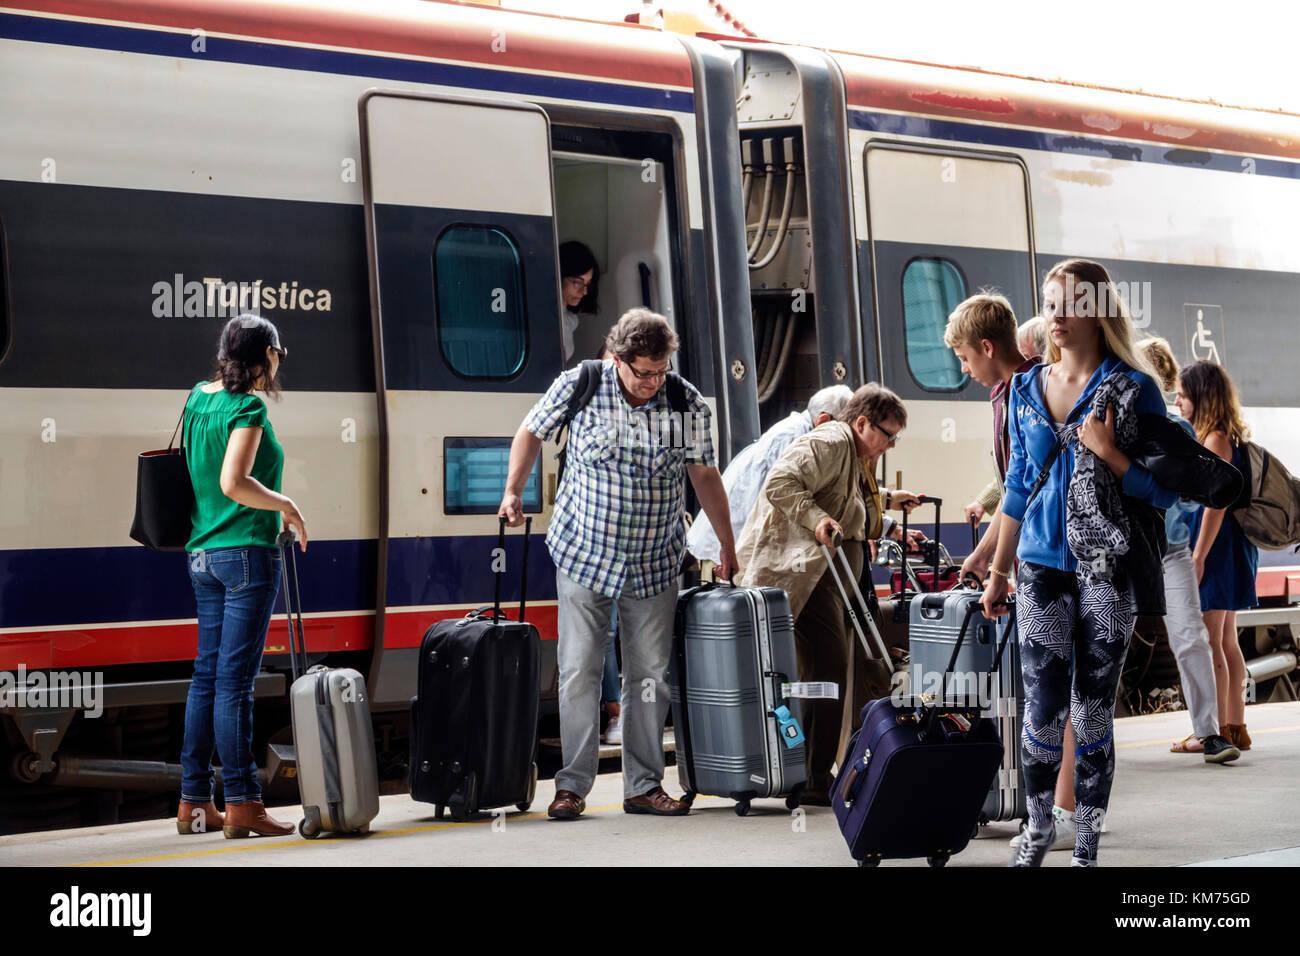 Coimbra Portugal Coimbra B Comboios de Portugal railway train station platform arrival man woman girl teen luggage - Stock Image